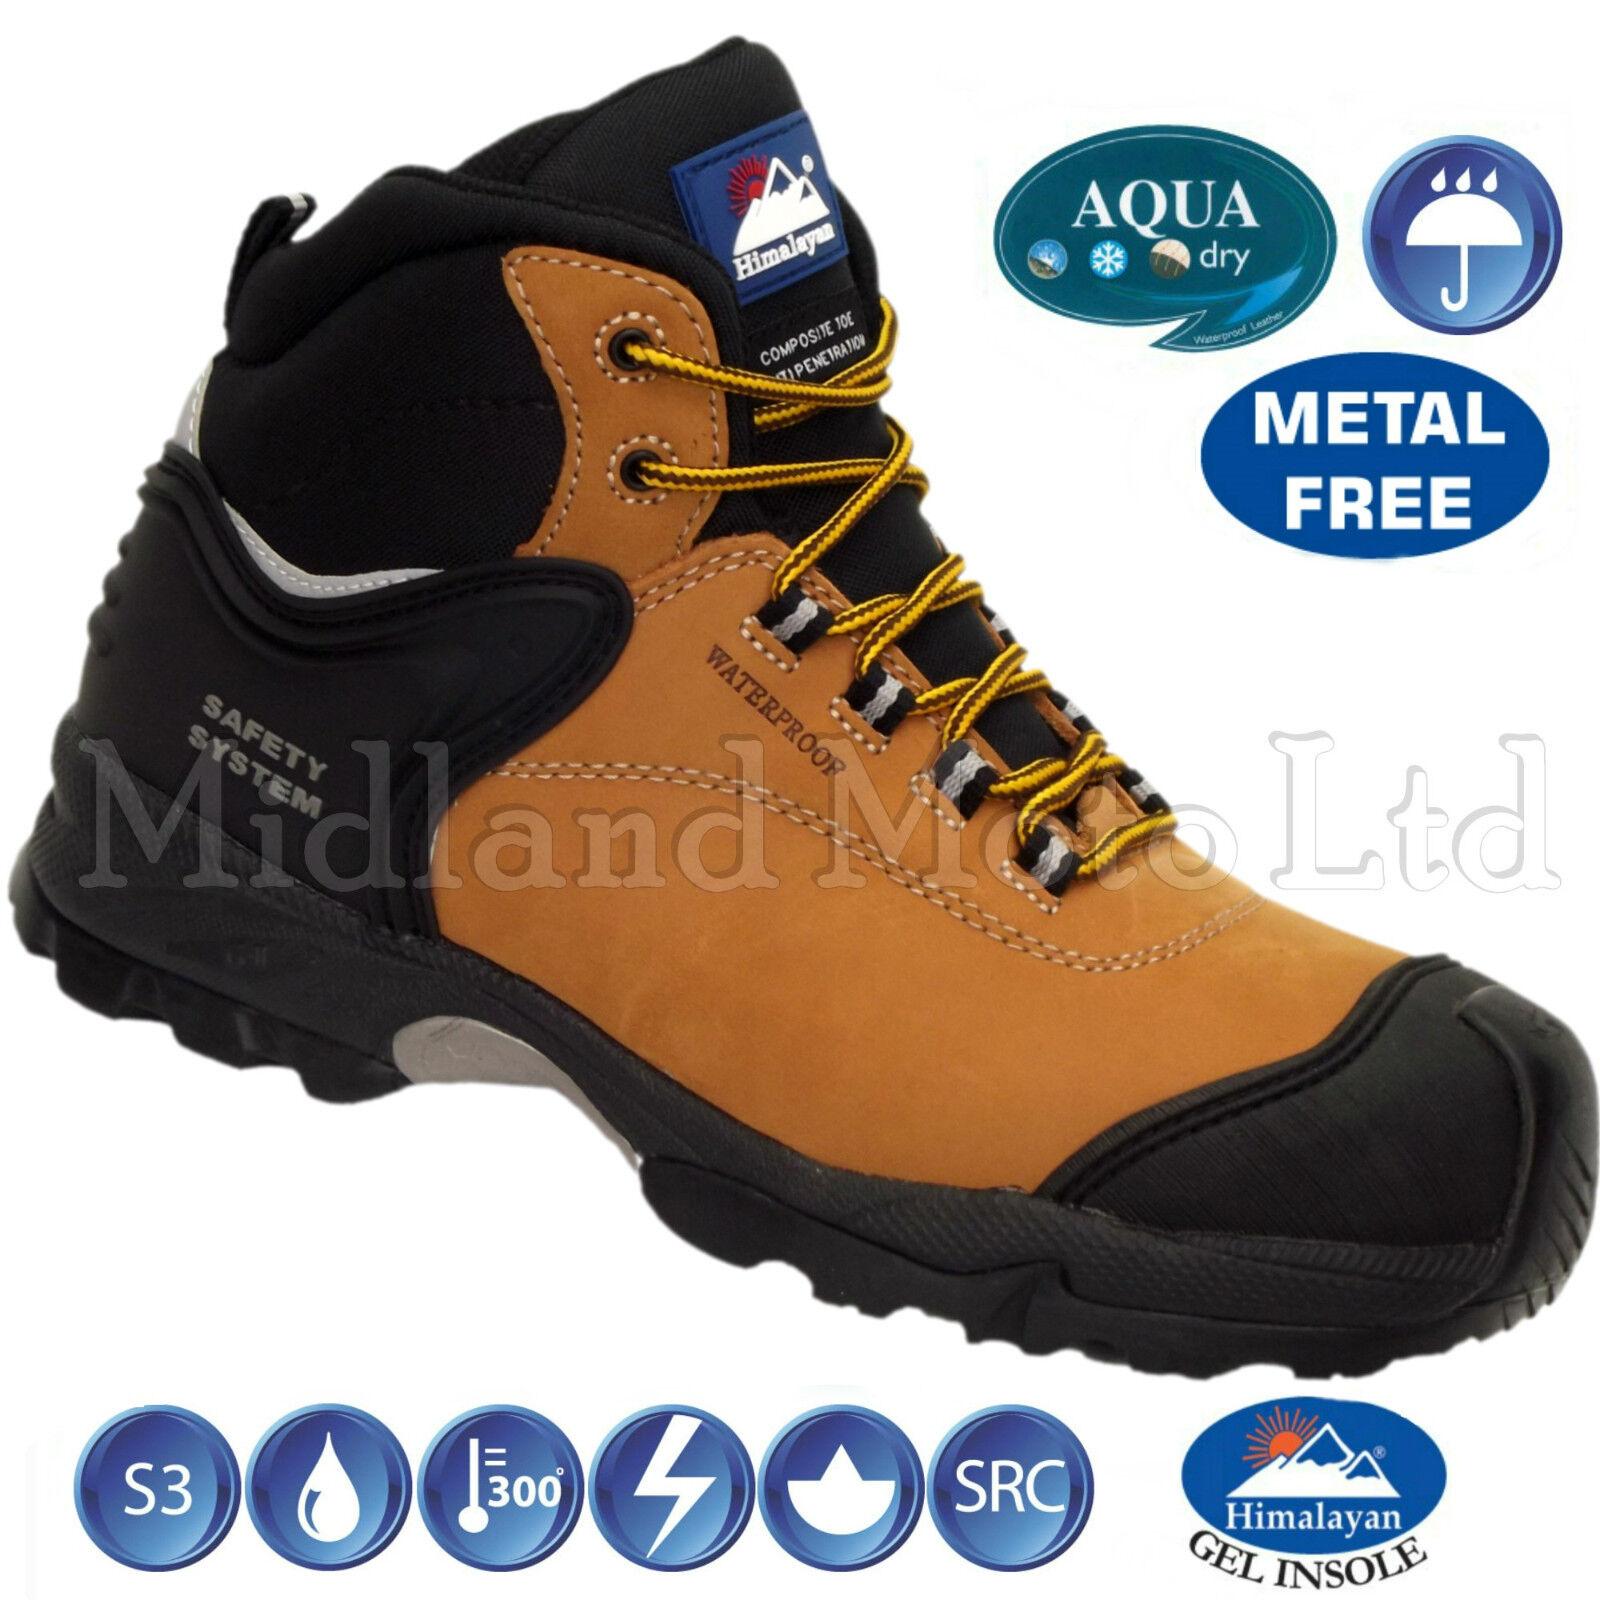 Waterproof Composite Toe Cap S3 Honey Nubuck Safety Boots, No Metal,  Detecting